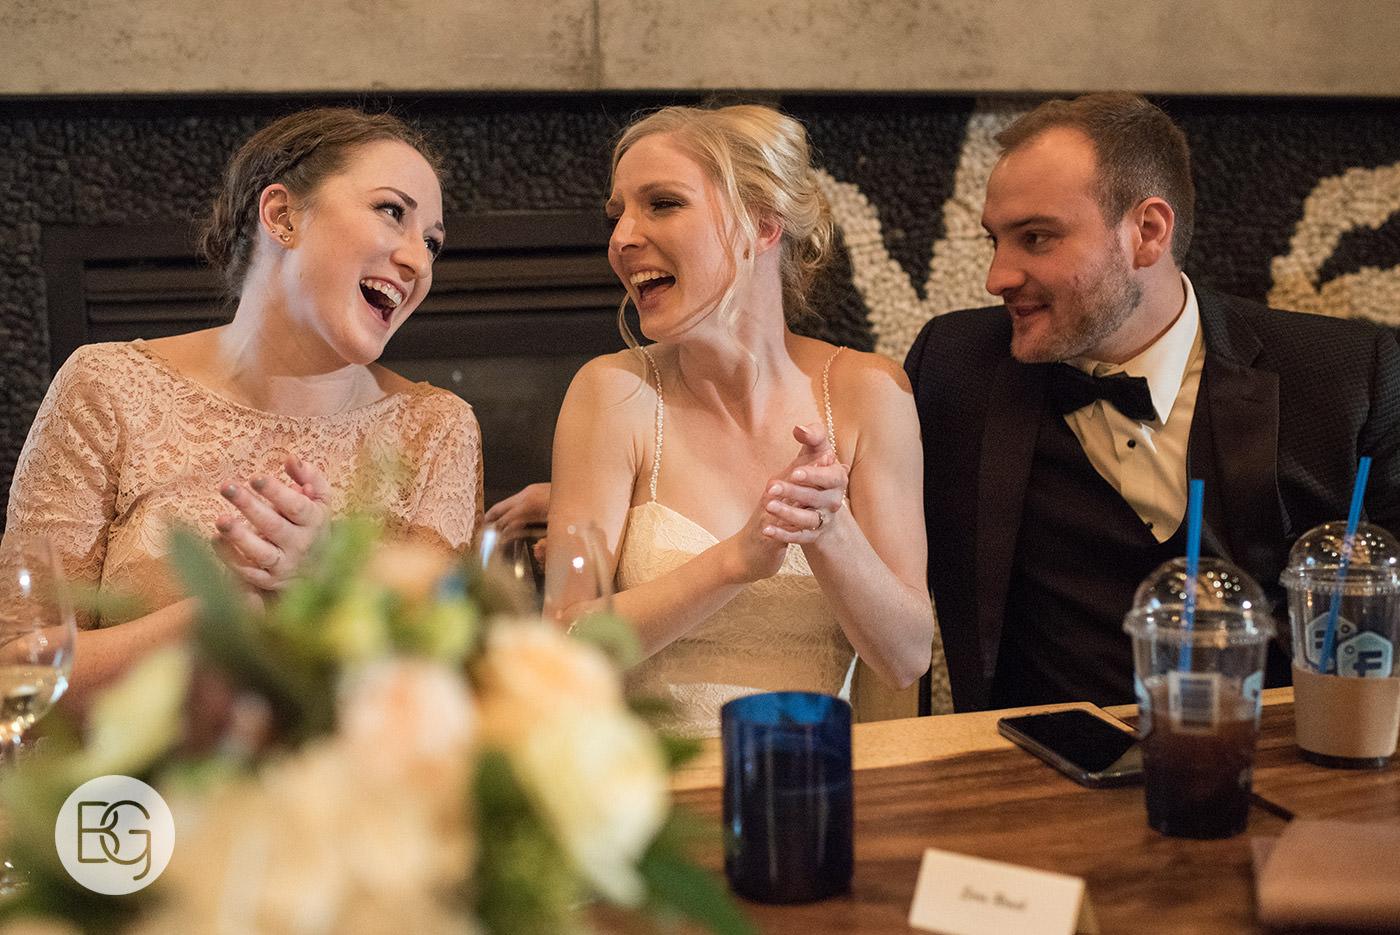 Edmonton_wedding_photographers_josh_sara_whyte_38.jpg